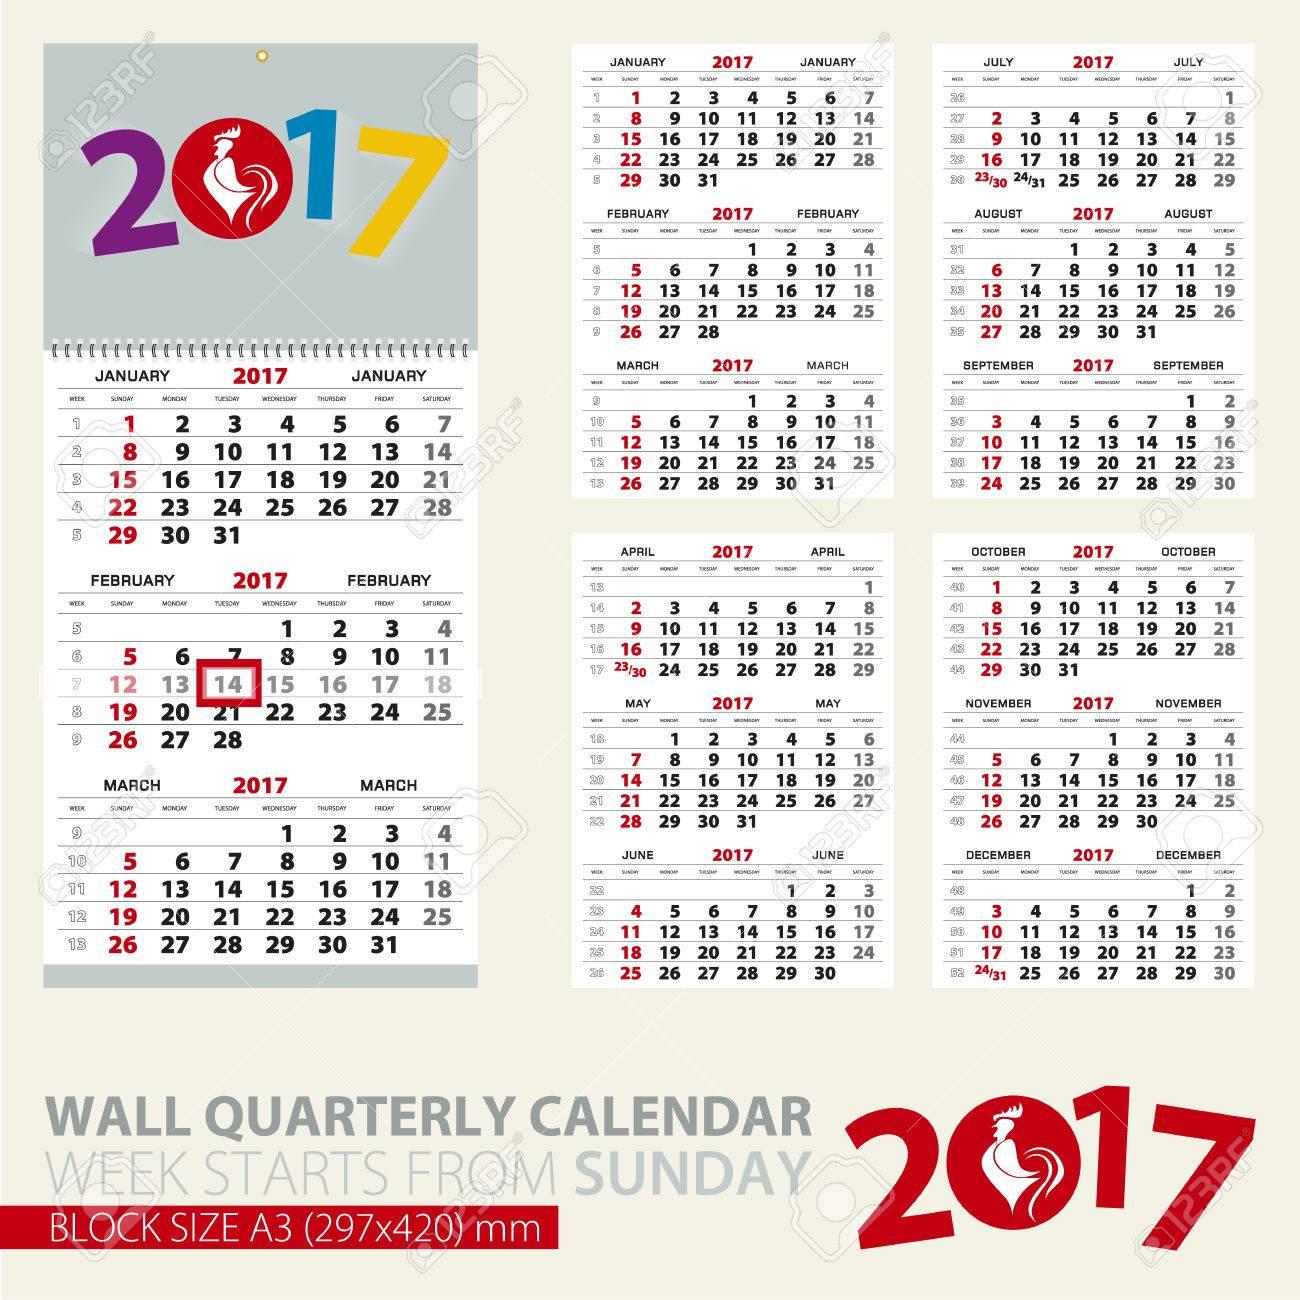 calendar for 2017 year print template of wall quarterly calendar block size a3